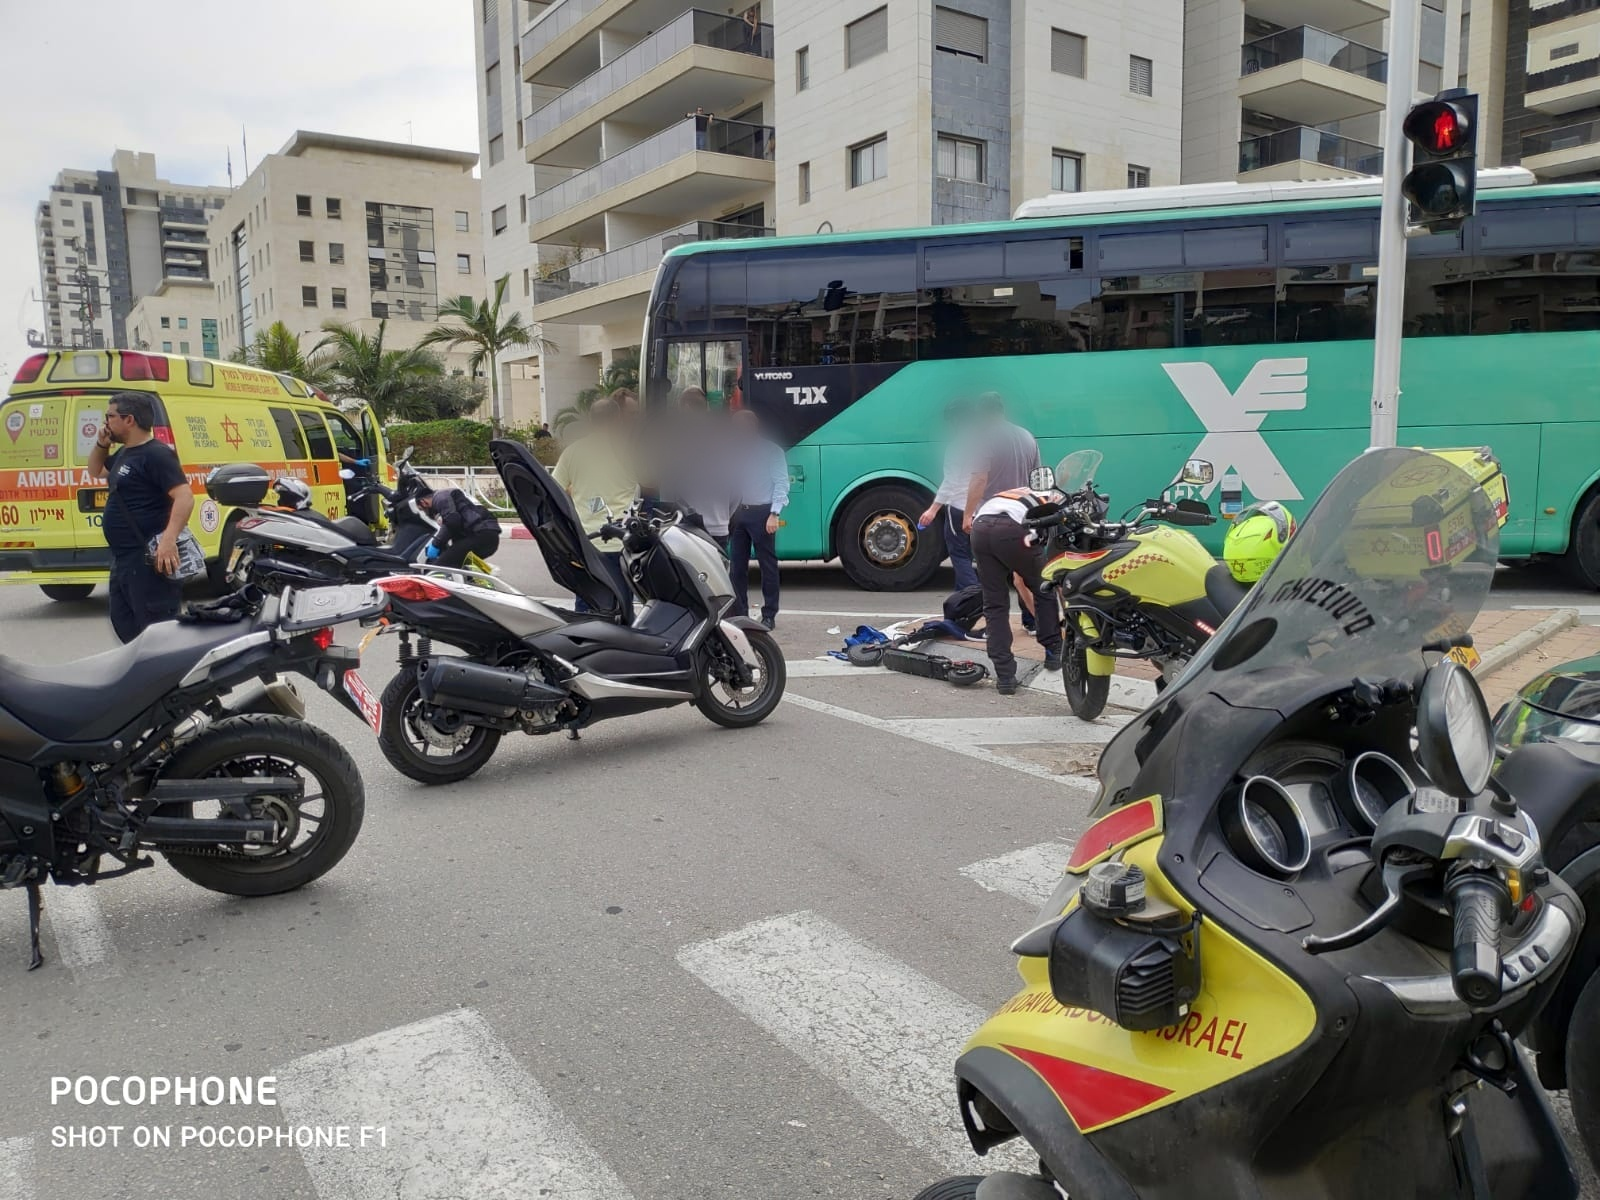 "Photo of רוכב קורקינט בן 70 נפצע באורח קשה מאוד מפגיעת אוטובוס ברחוב גלילי בראשל""צ"